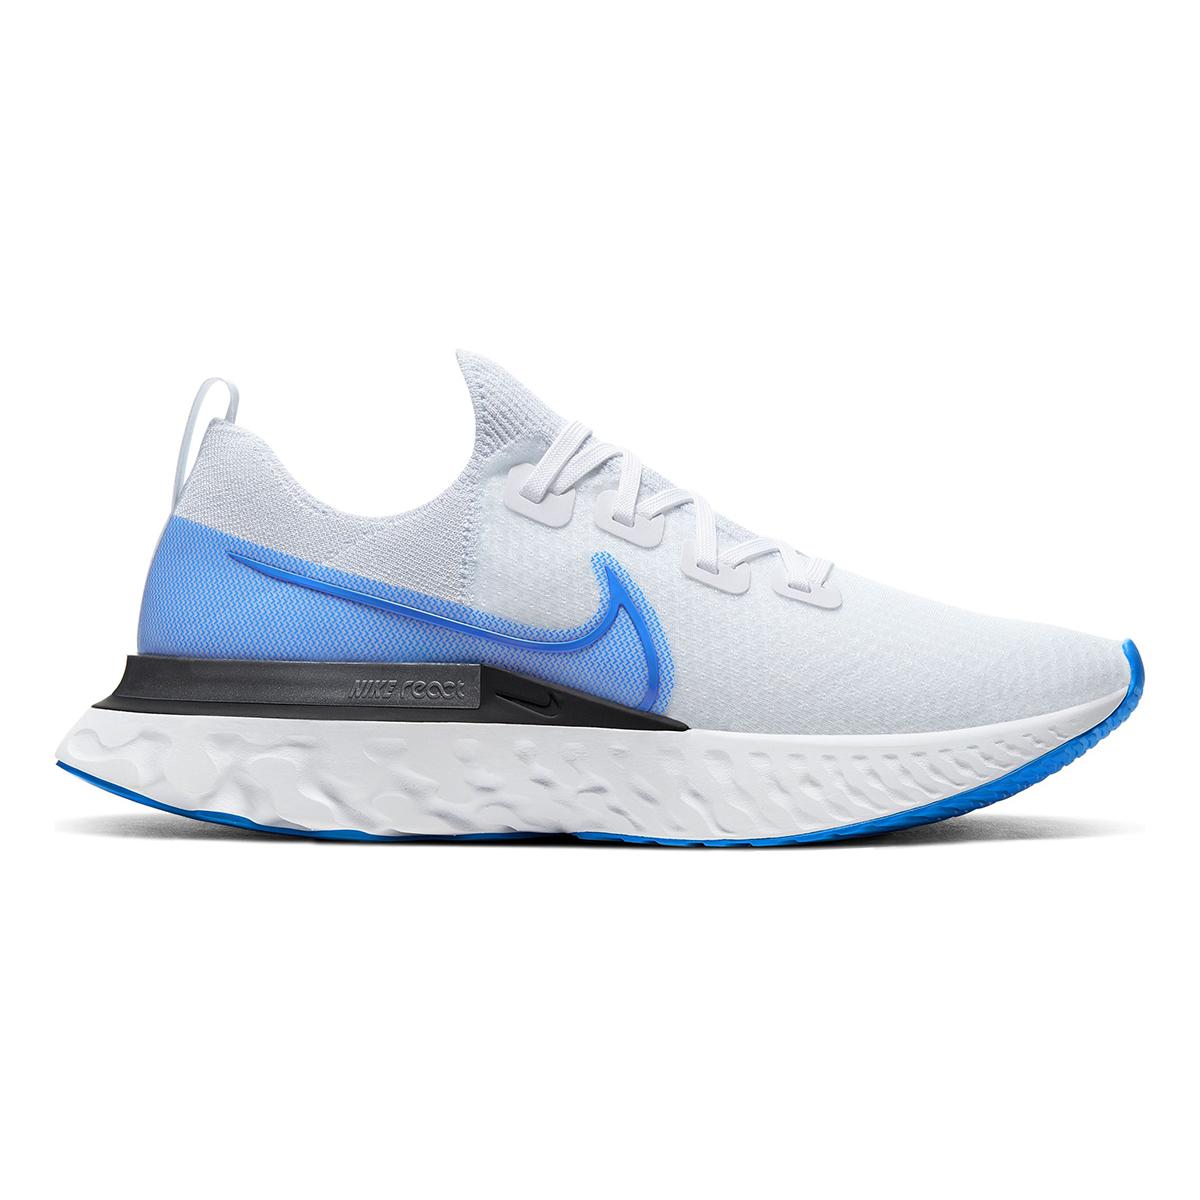 Men's Nike React Infinity Run Flyknit Running Shoe - Color: True White/White/Pure (Regular Width) - Size: 6, True White/White/Pure, large, image 1